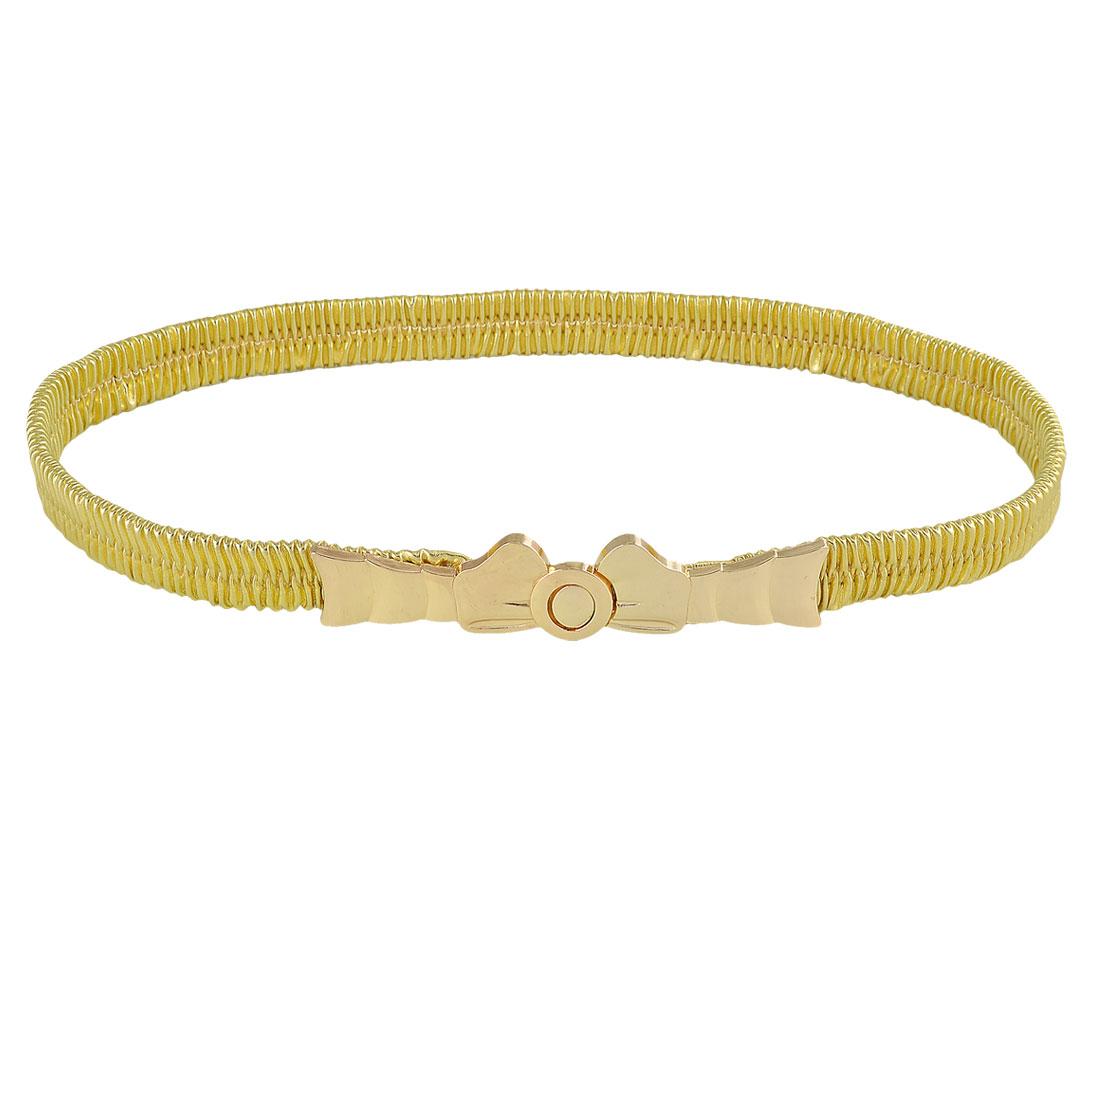 Lady Gold Tone Bowknot Interlocking Buckle Faux Leather Stretch Skinny Cinch Waist Belt